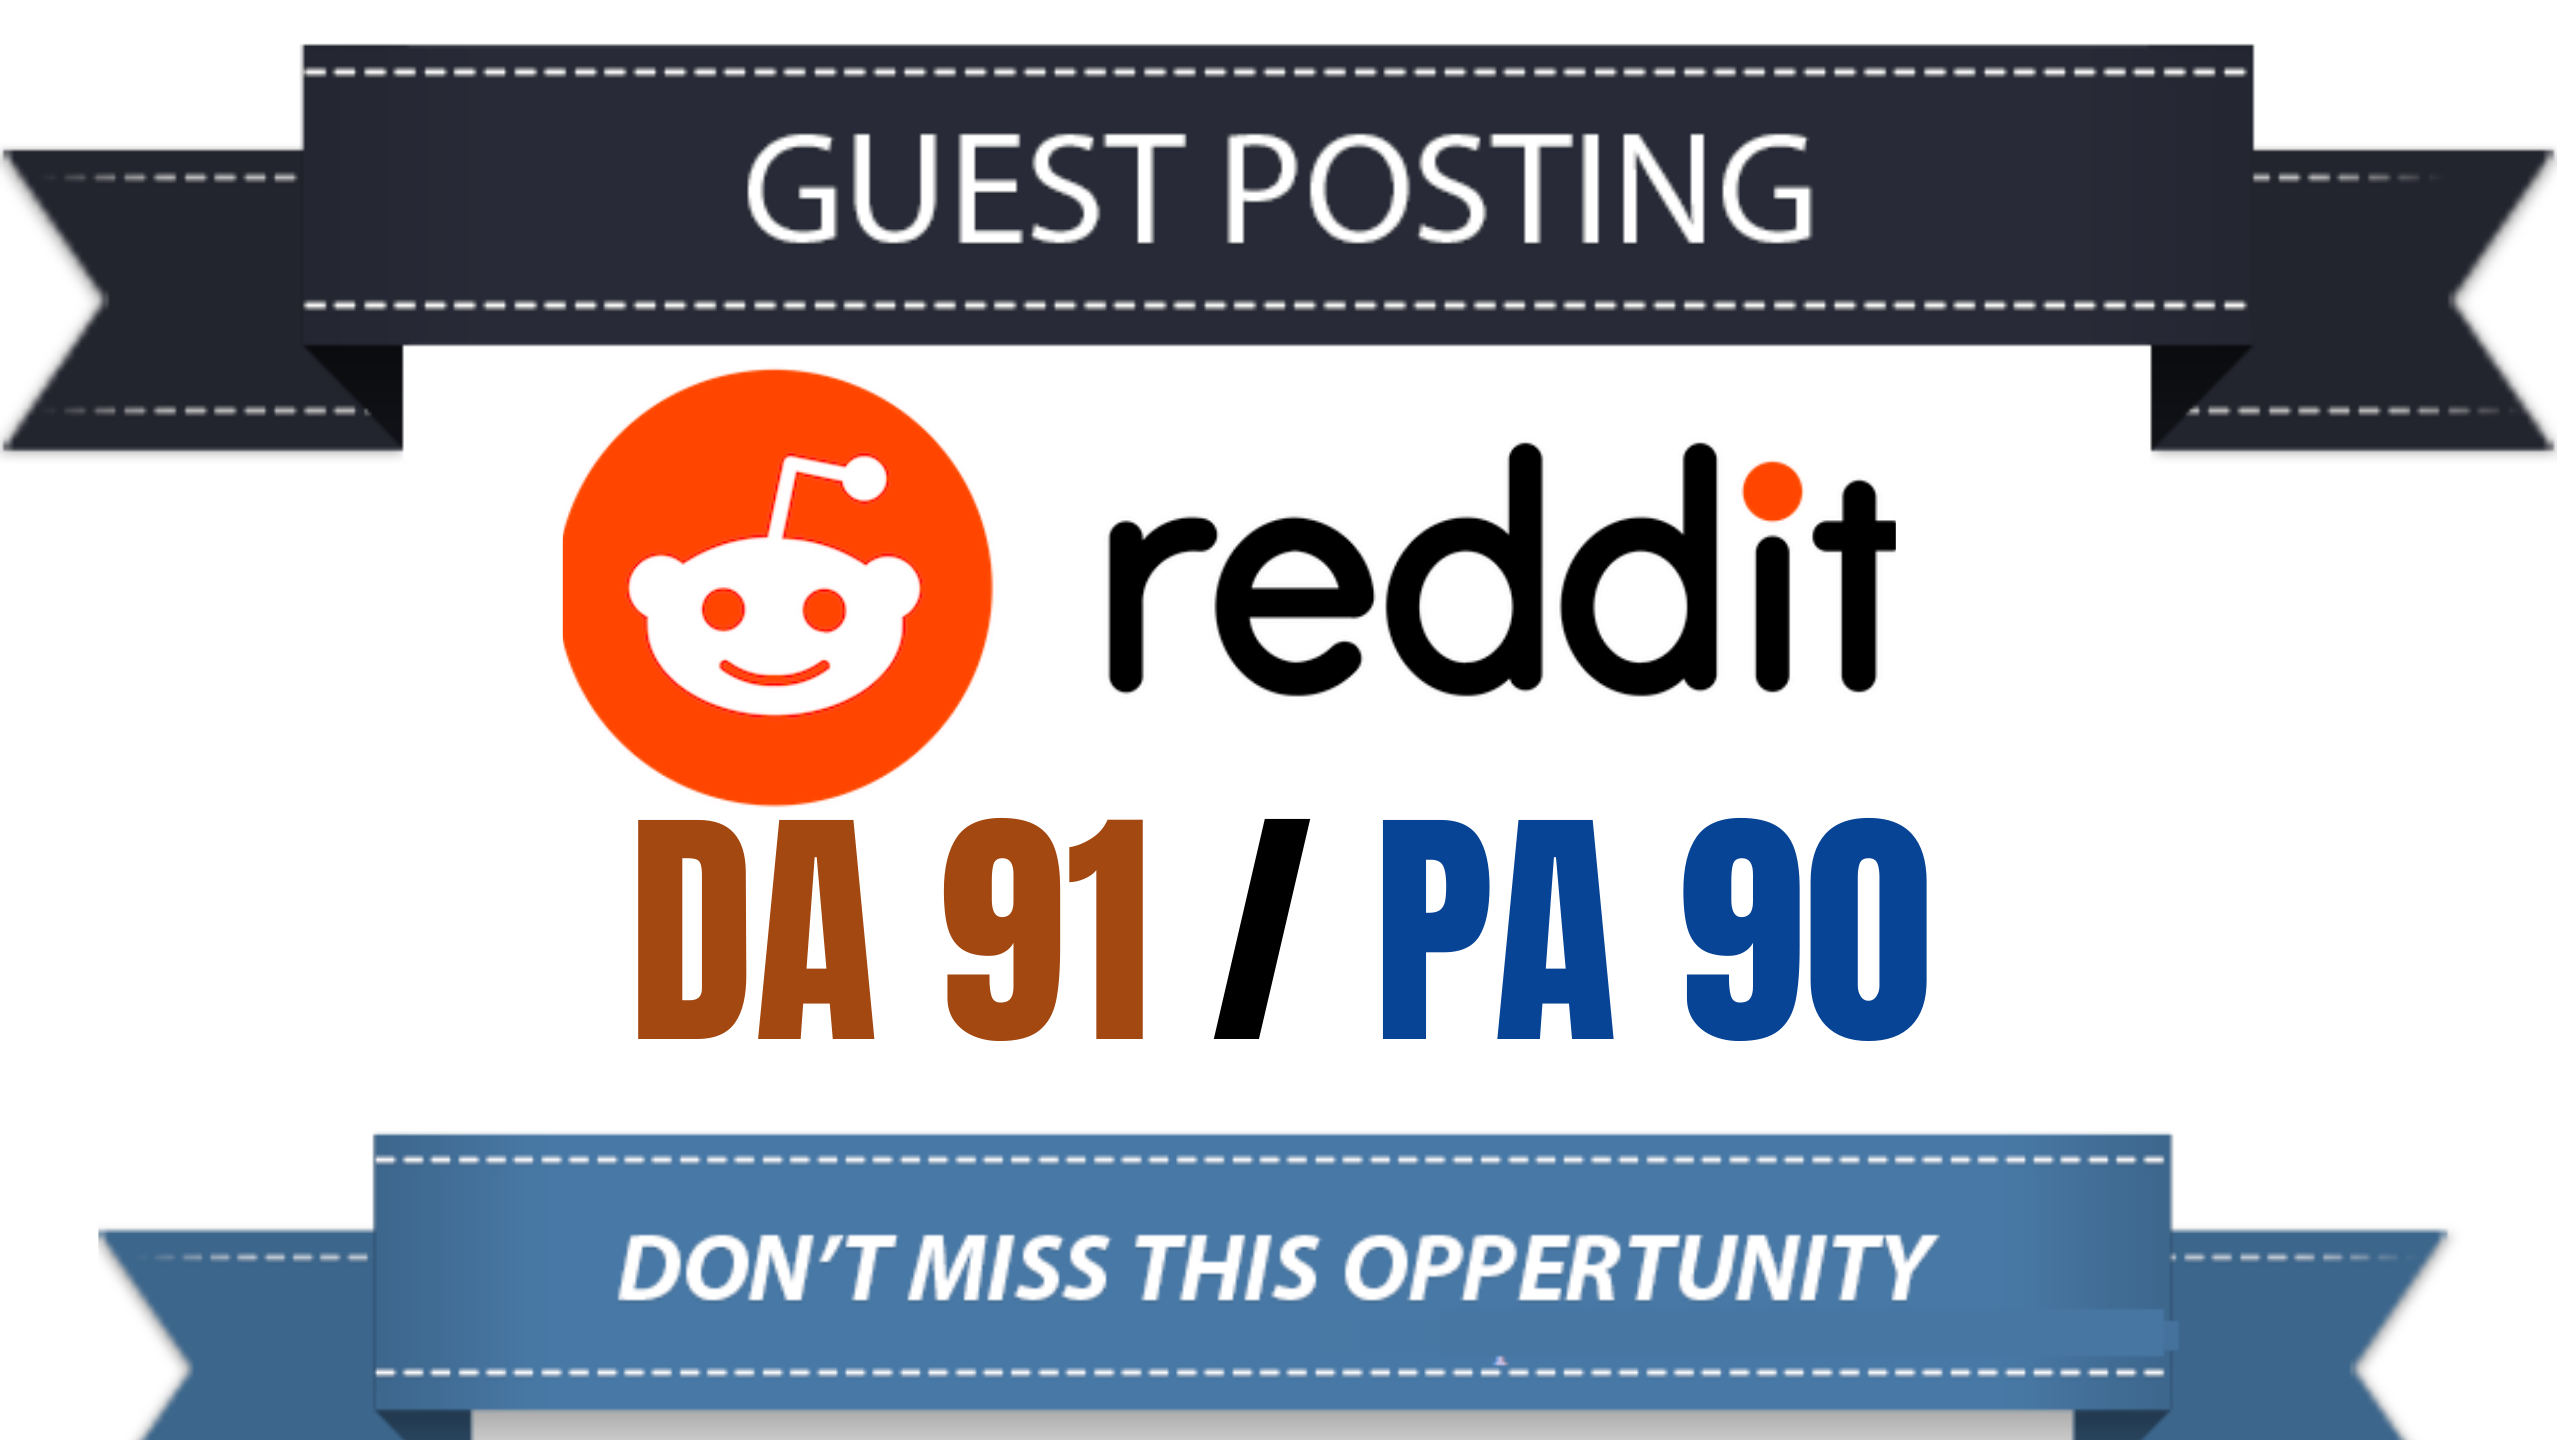 Write And Publish Guest Post On High DA91/ PA90 Reddit - Reddit. com